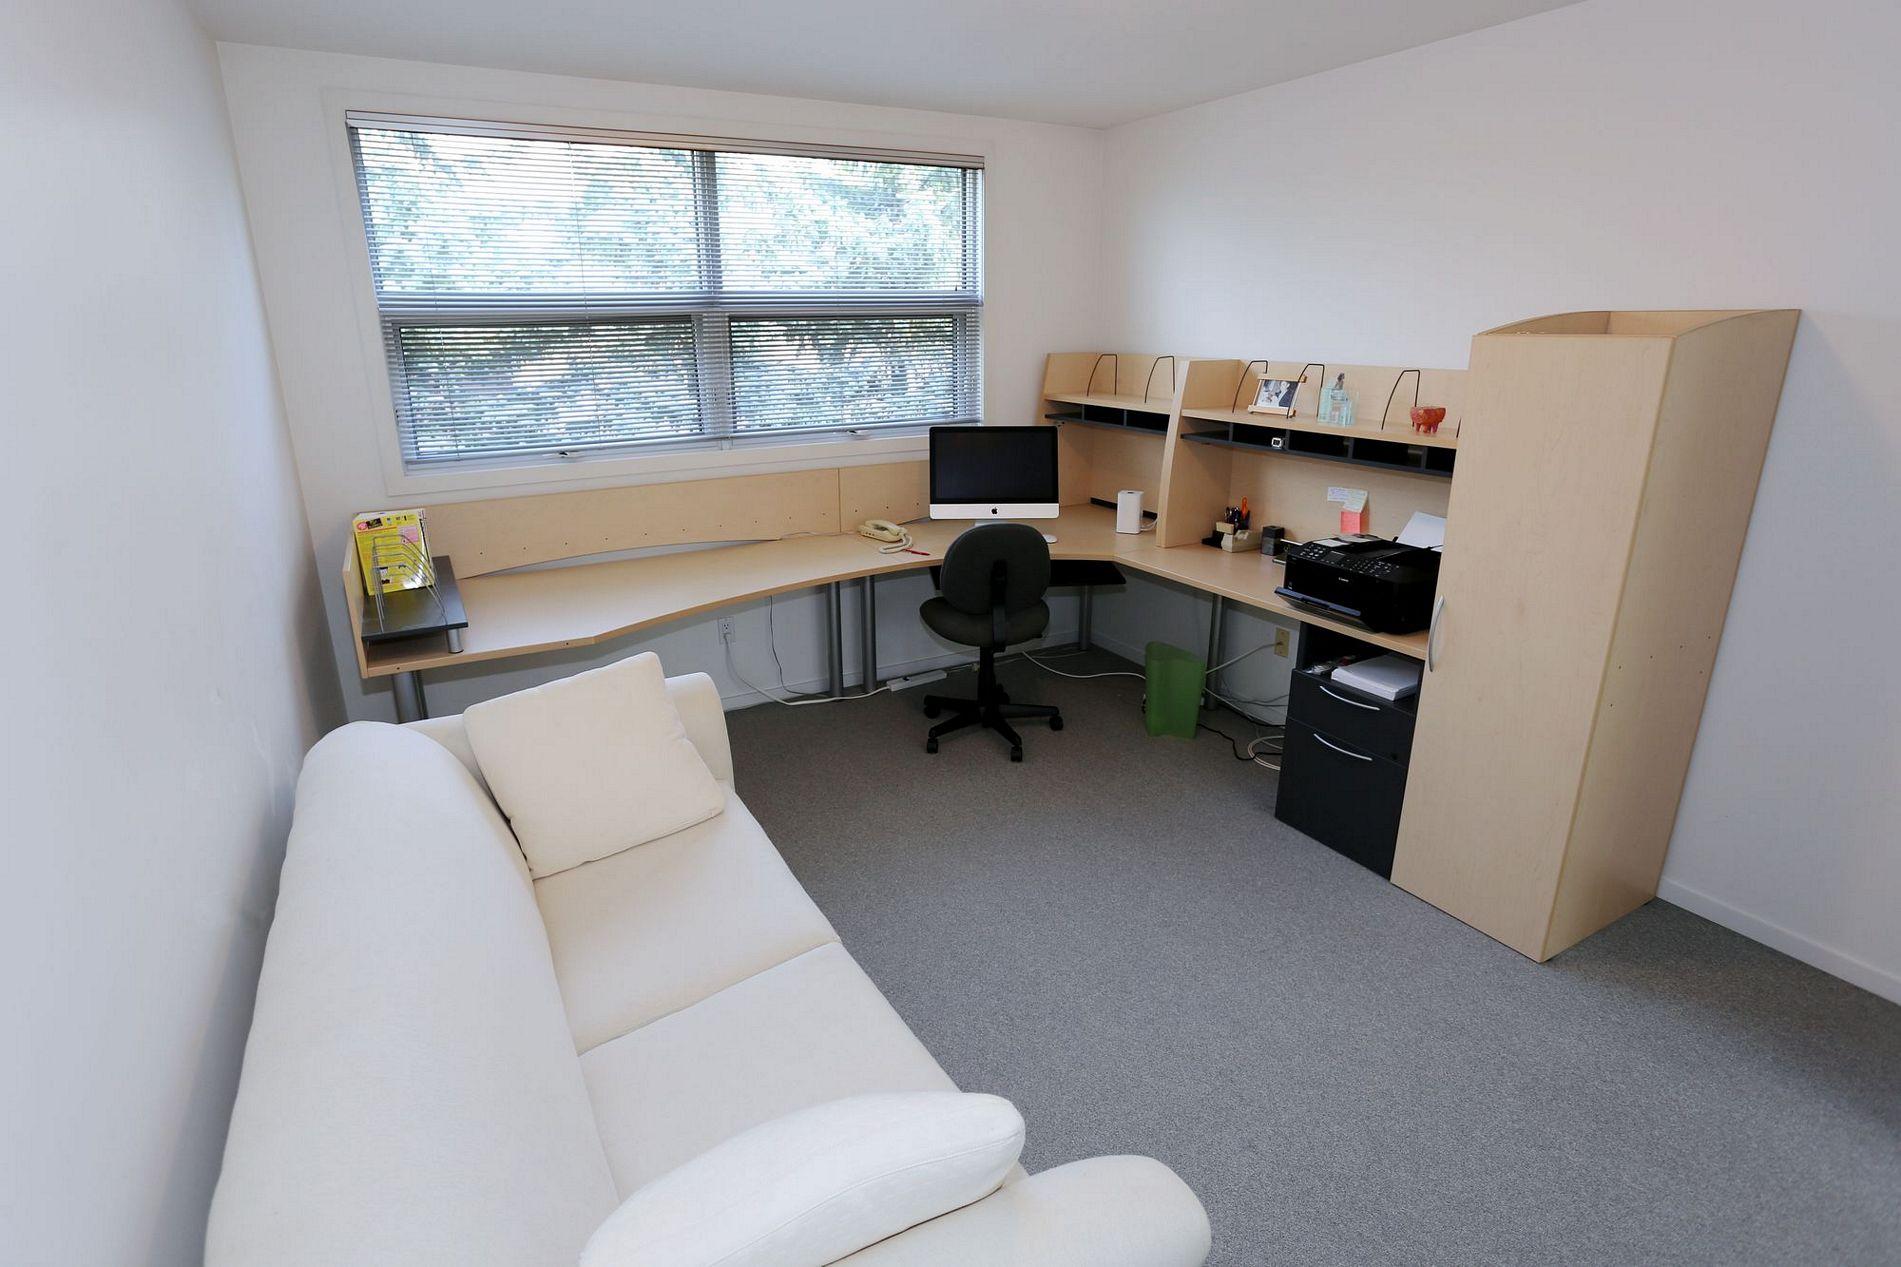 26 Burnley Place, Winnipeg, Manitoba  R3P 2C2 - Photo 24 - 1711404